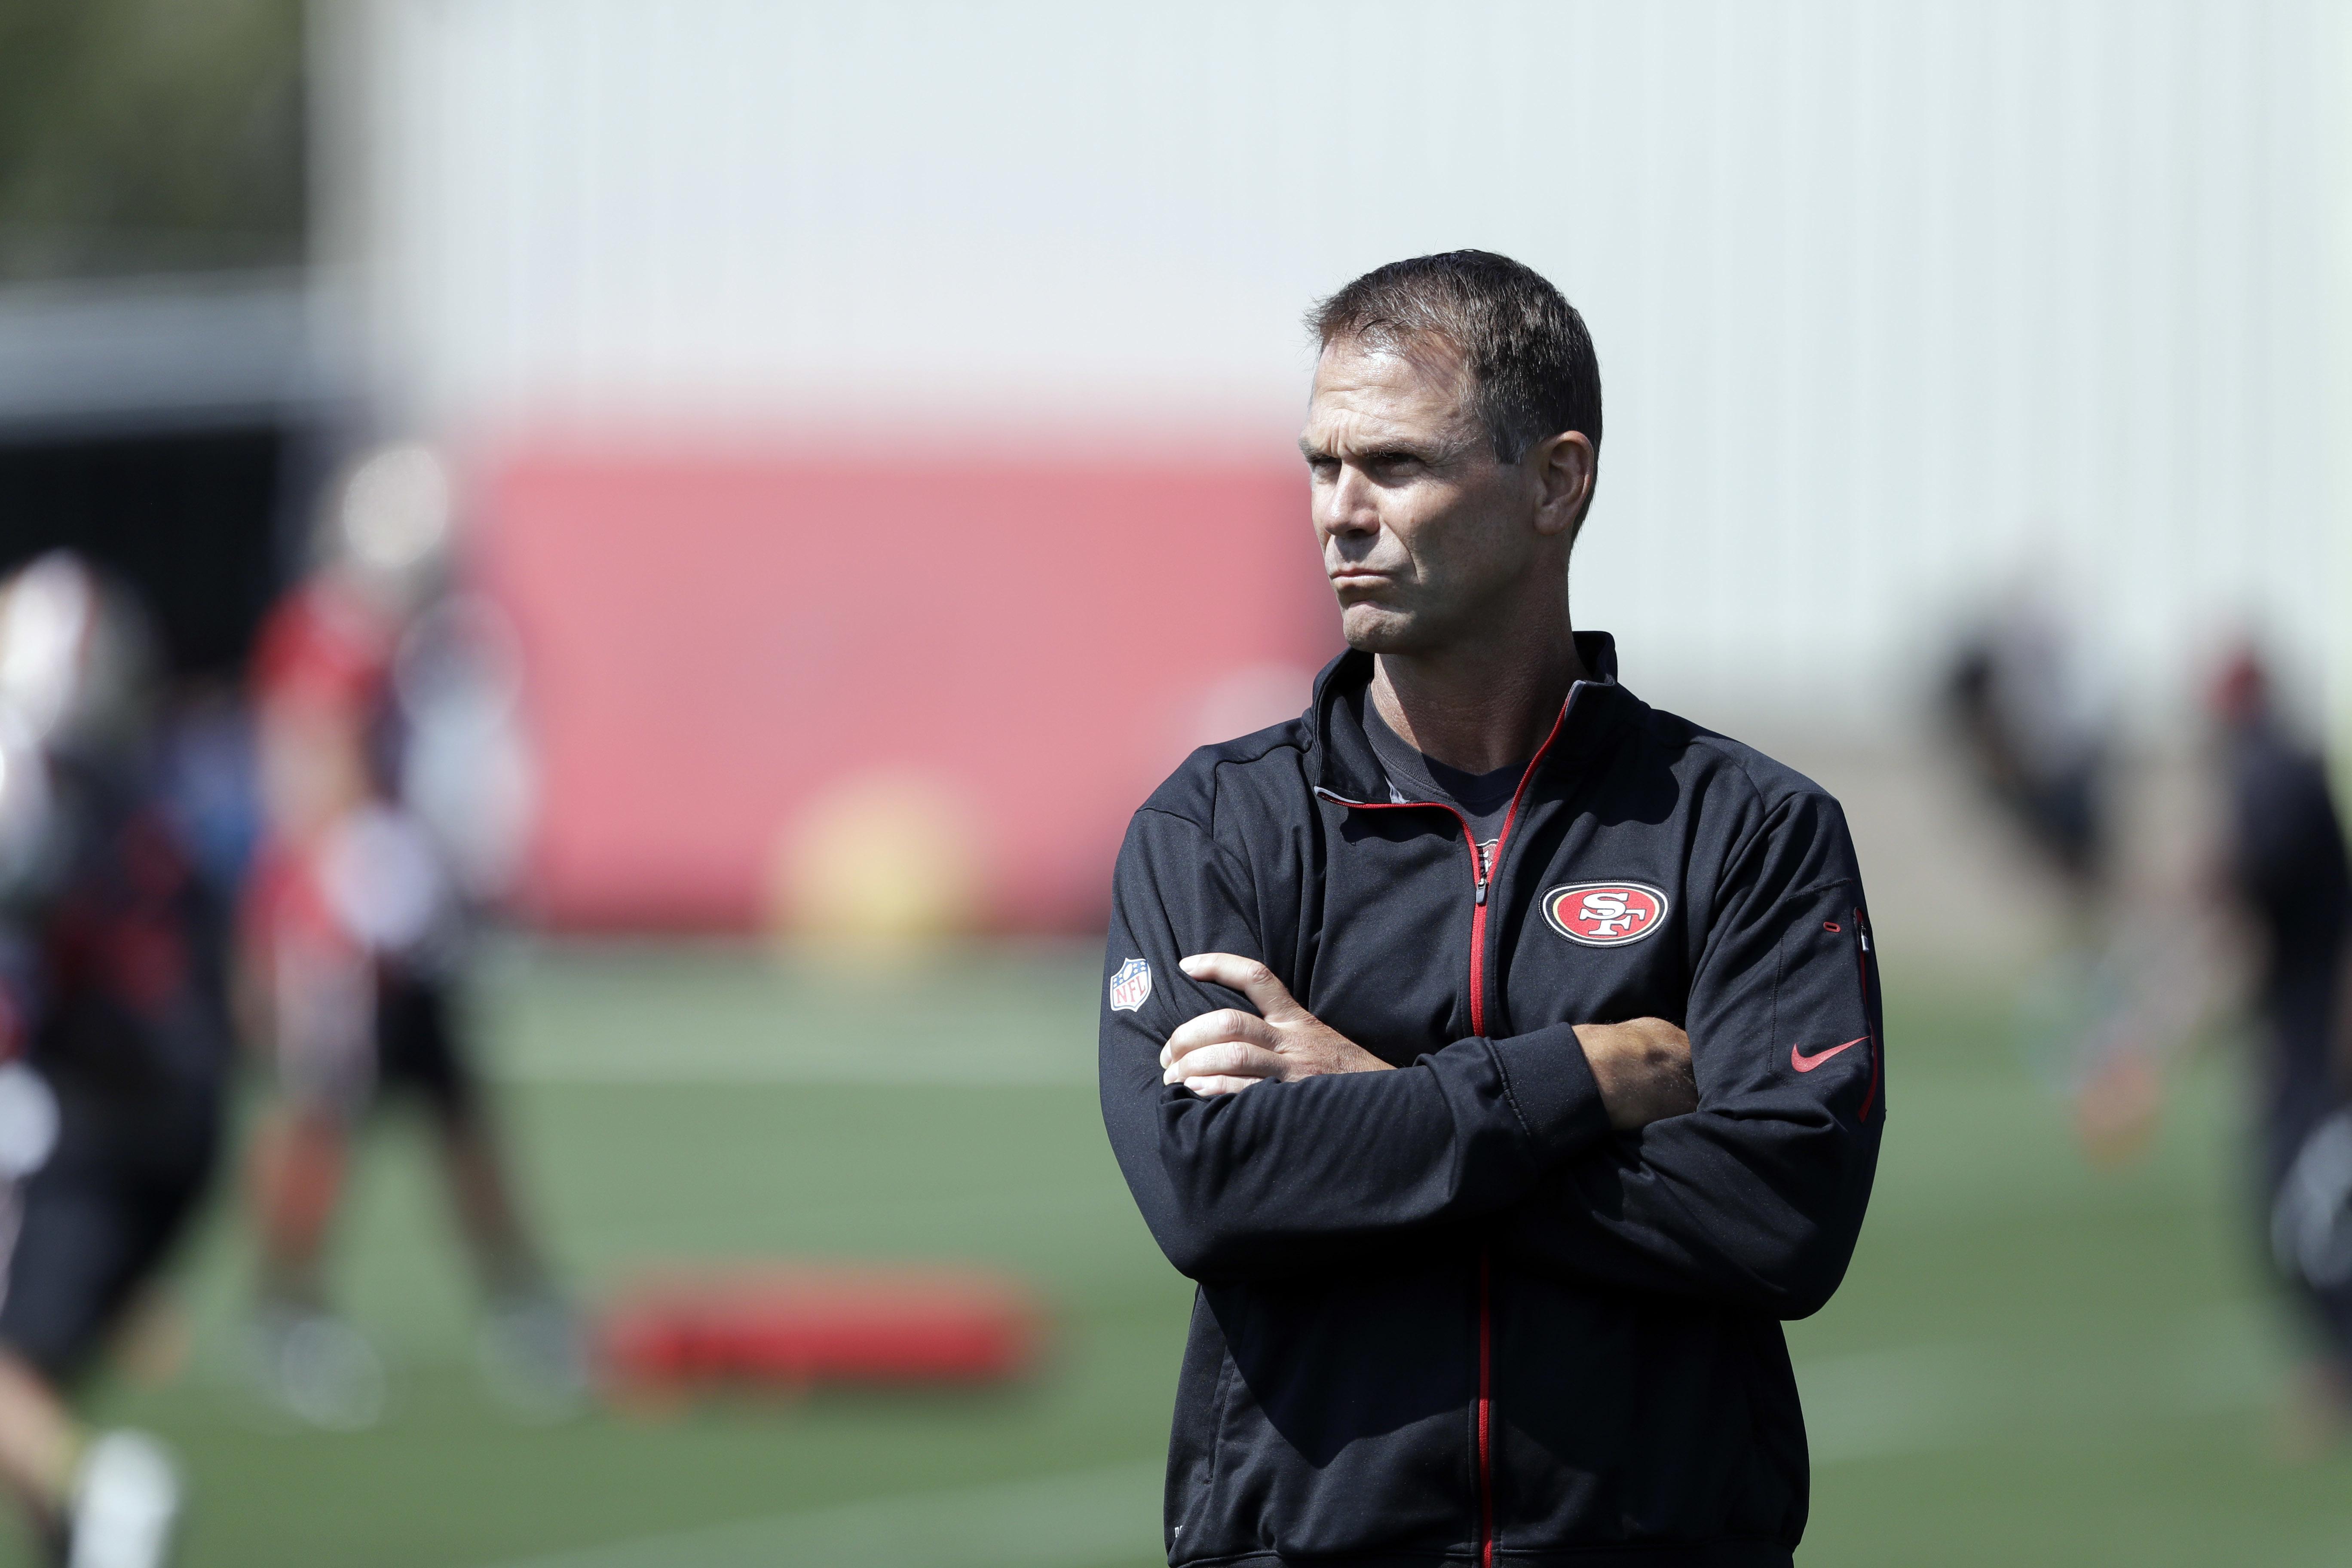 49ers_bye_football